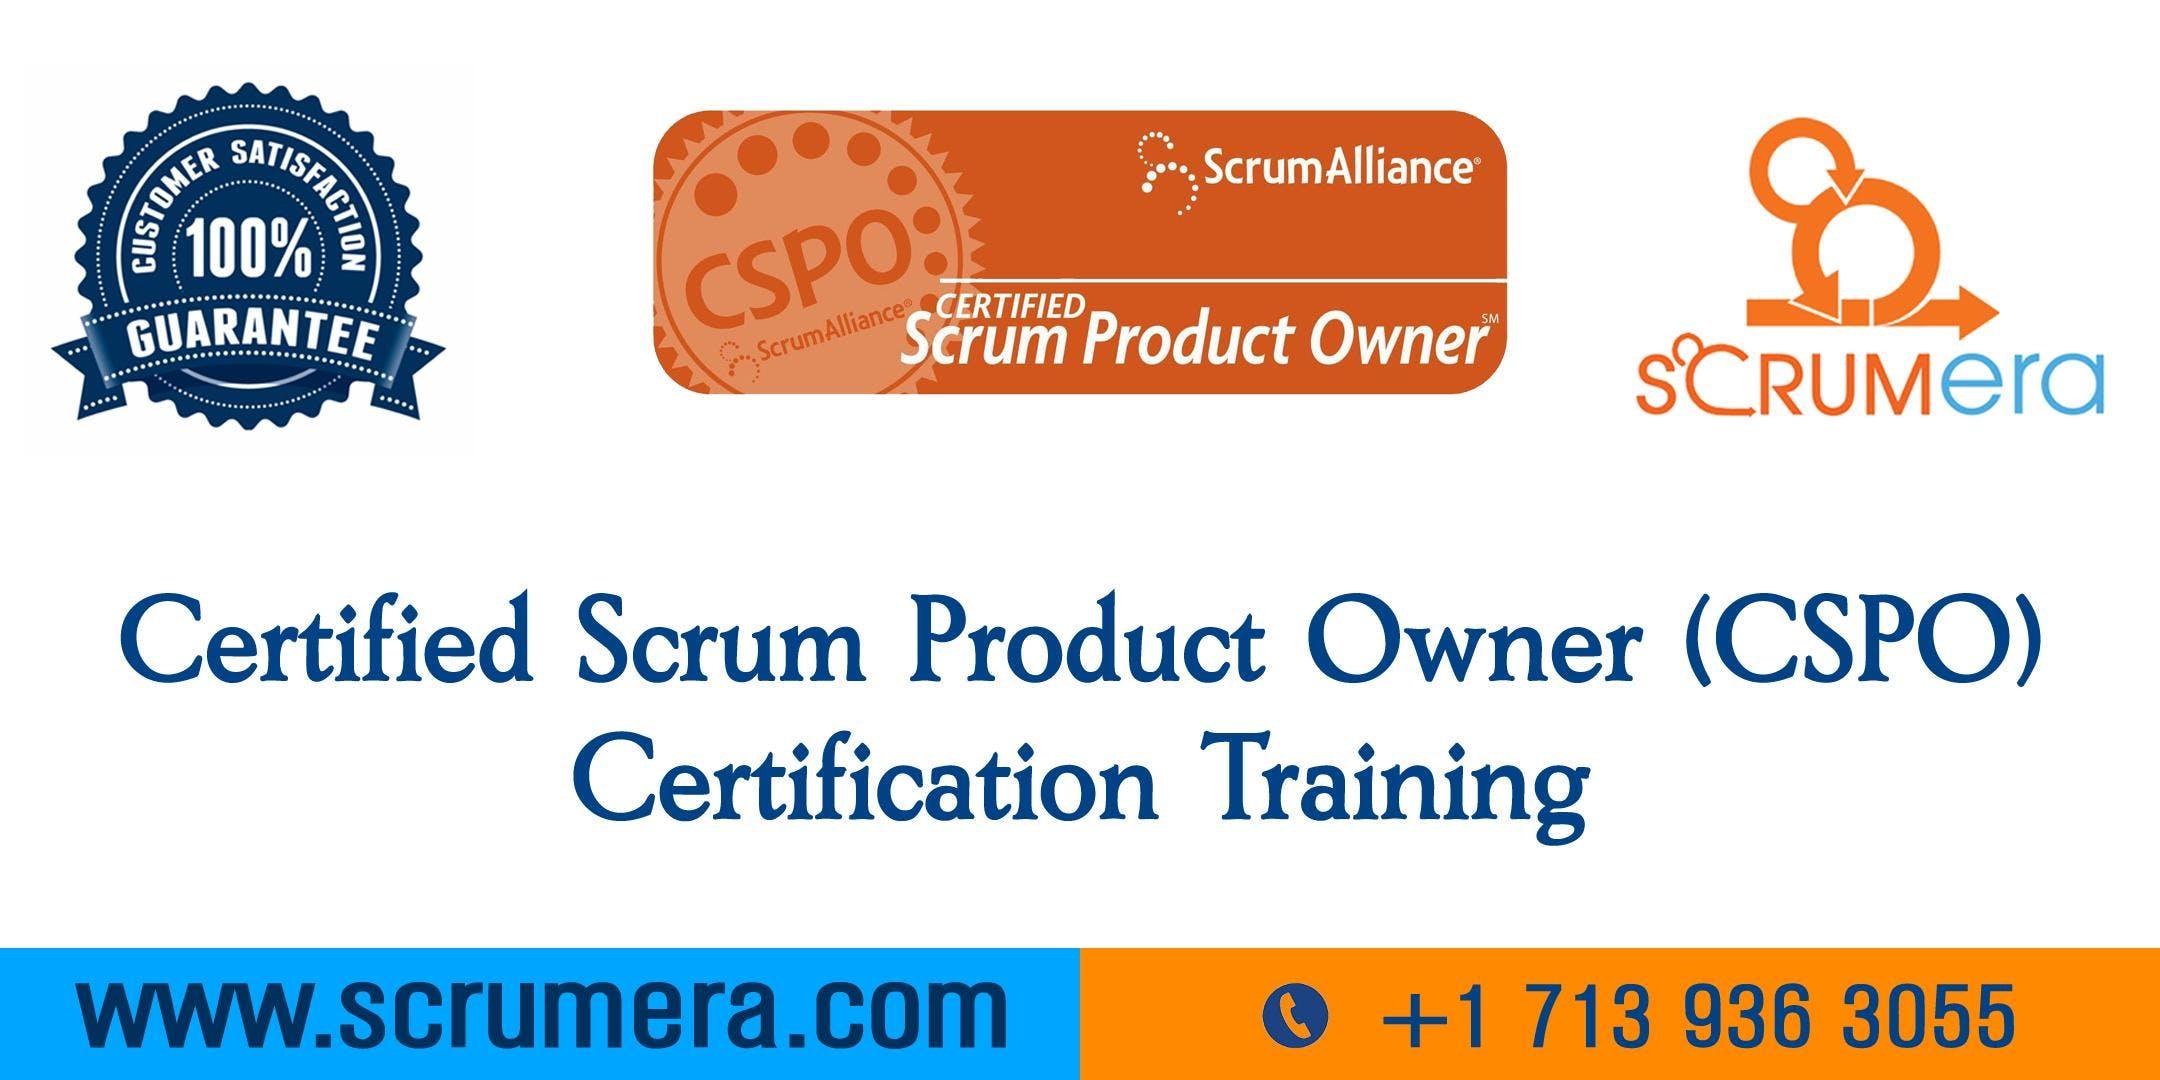 Certified Scrum Product Owner (CSPO) Certification | CSPO Training | CSPO Certification Workshop | Certified Scrum Product Owner (CSPO) Training in Scottsdale, AZ | ScrumERA